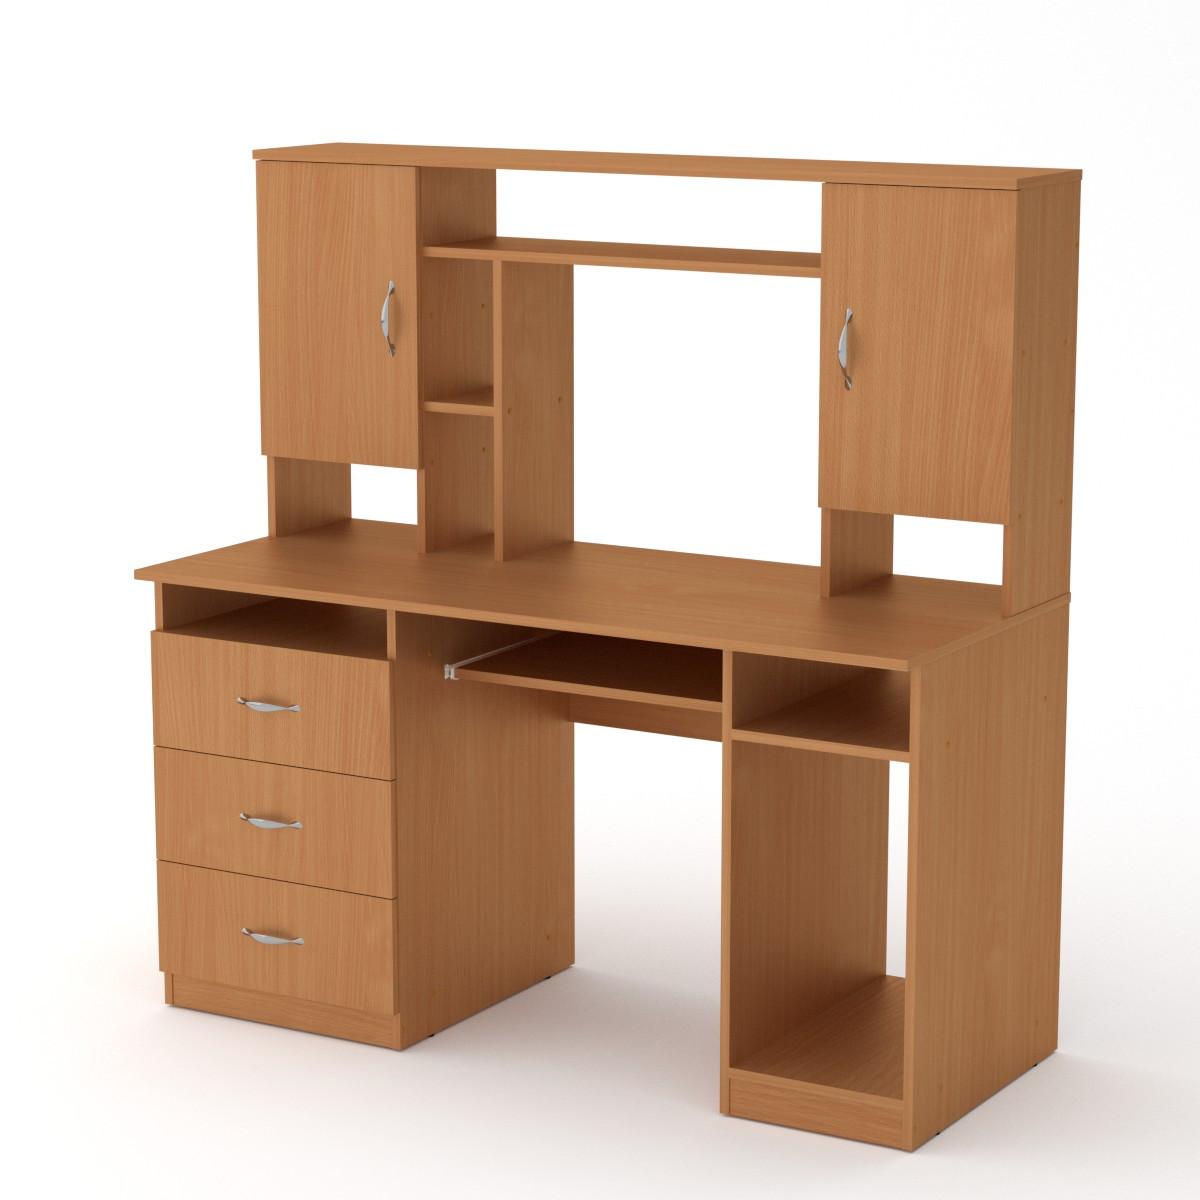 Стол компьютерный менеджер бук Компанит (140х60х142 см)